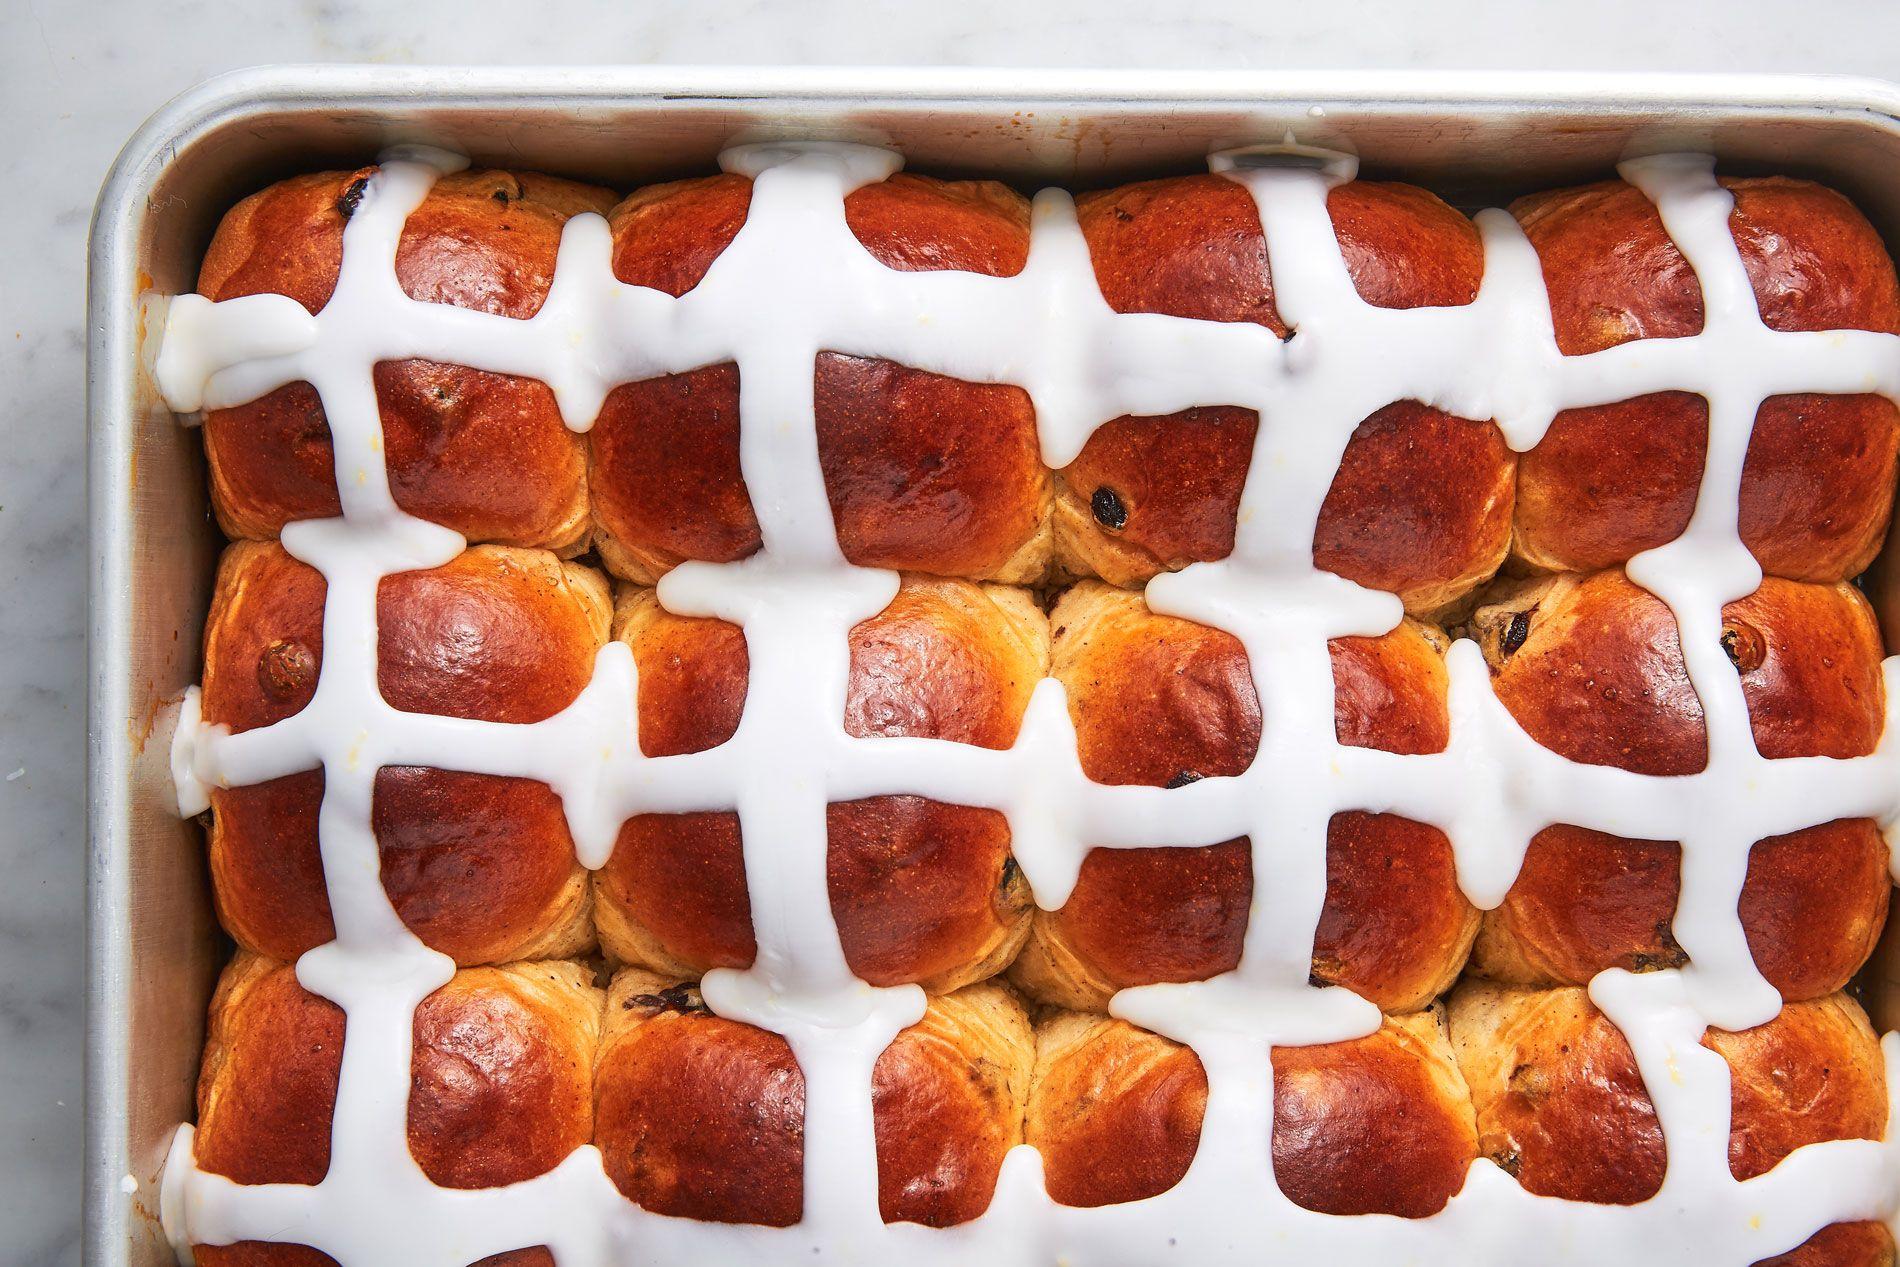 Best Traditional Hot Cross Buns Recipe How To Make Hot Cross Buns